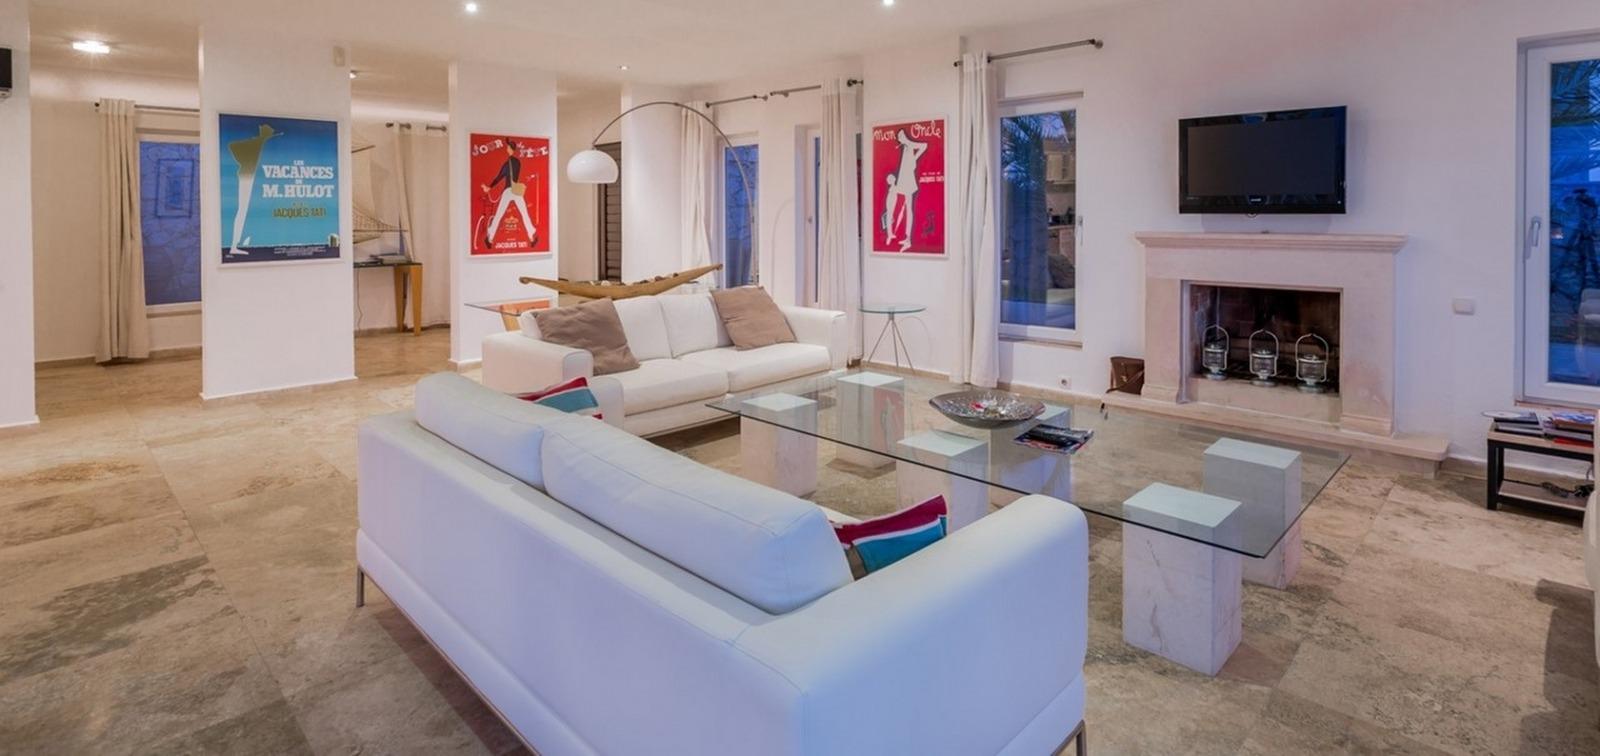 Firefly lounge (2)